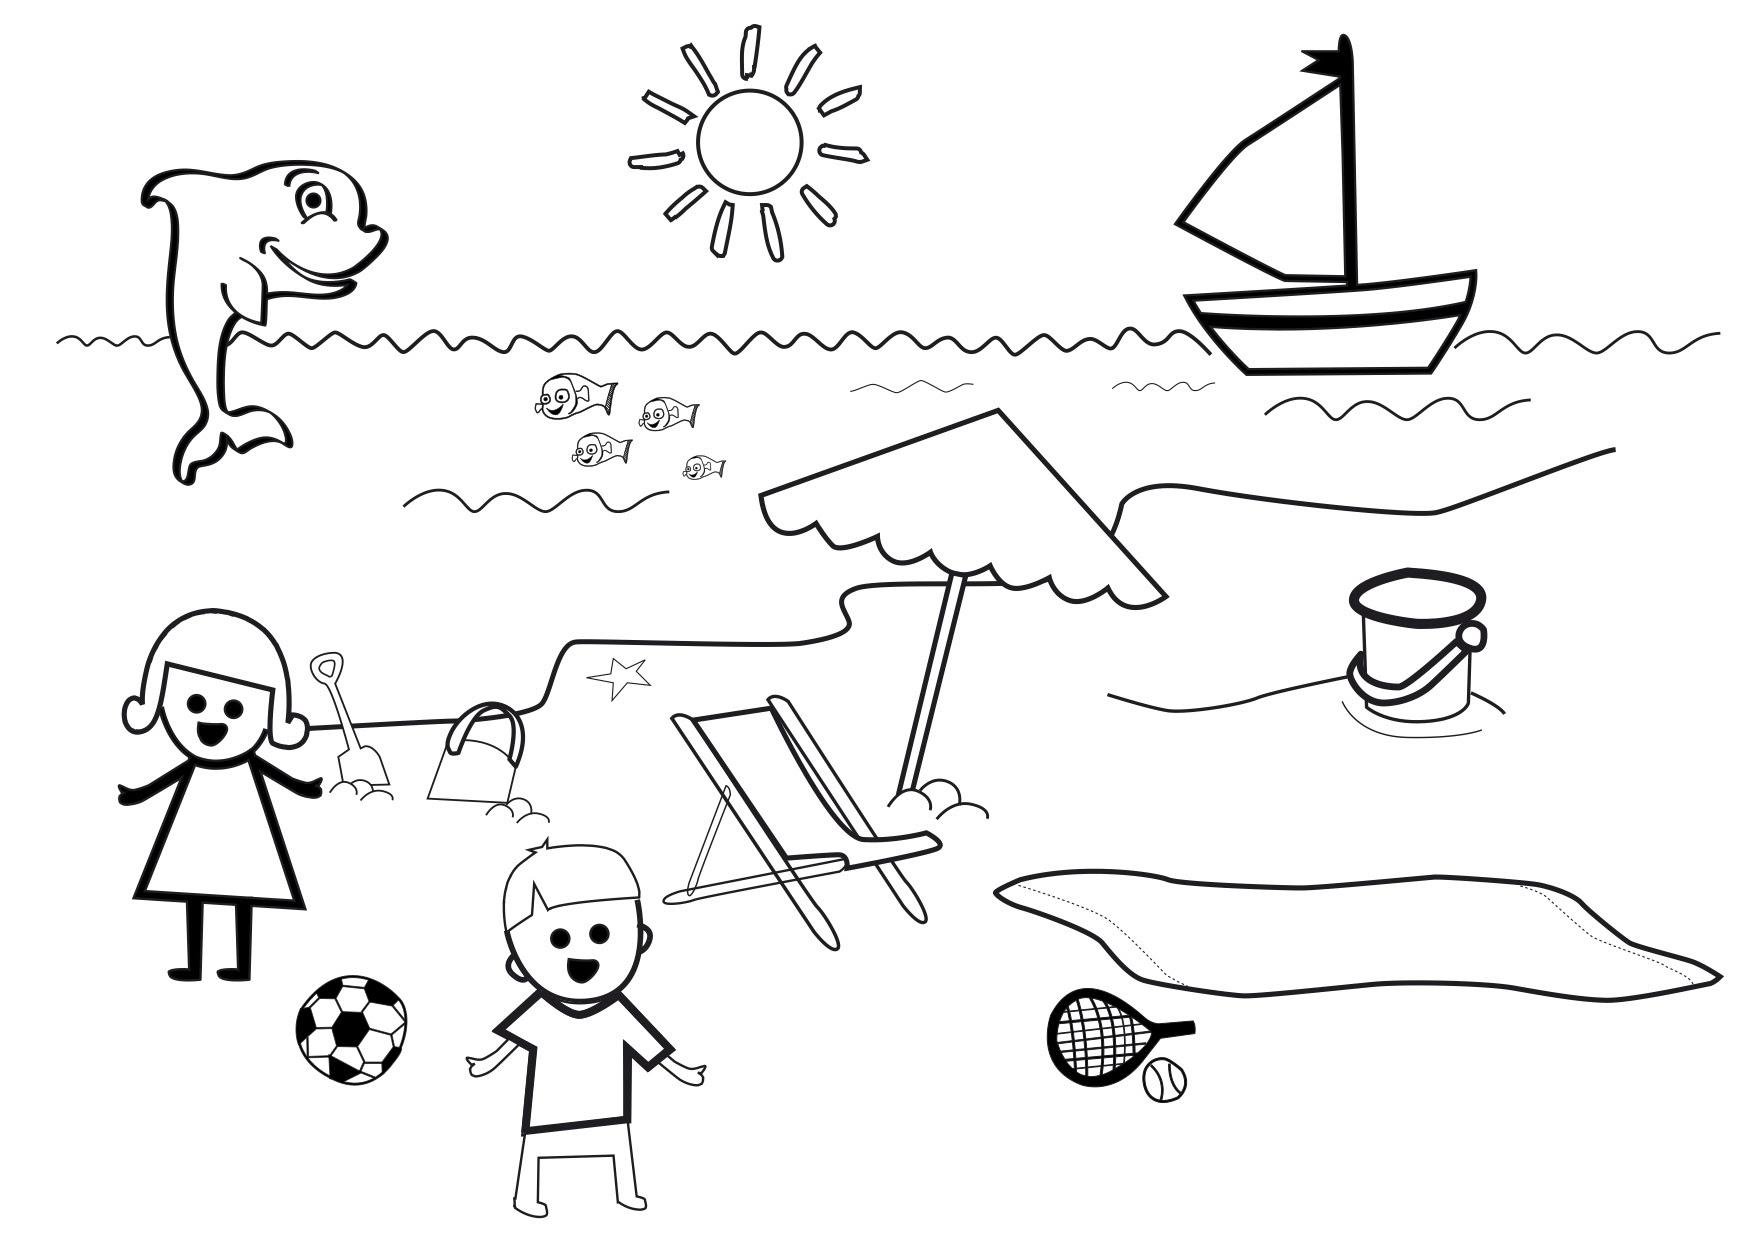 56 Dibujos De Playas Para Colorear Oh Kids Page 1